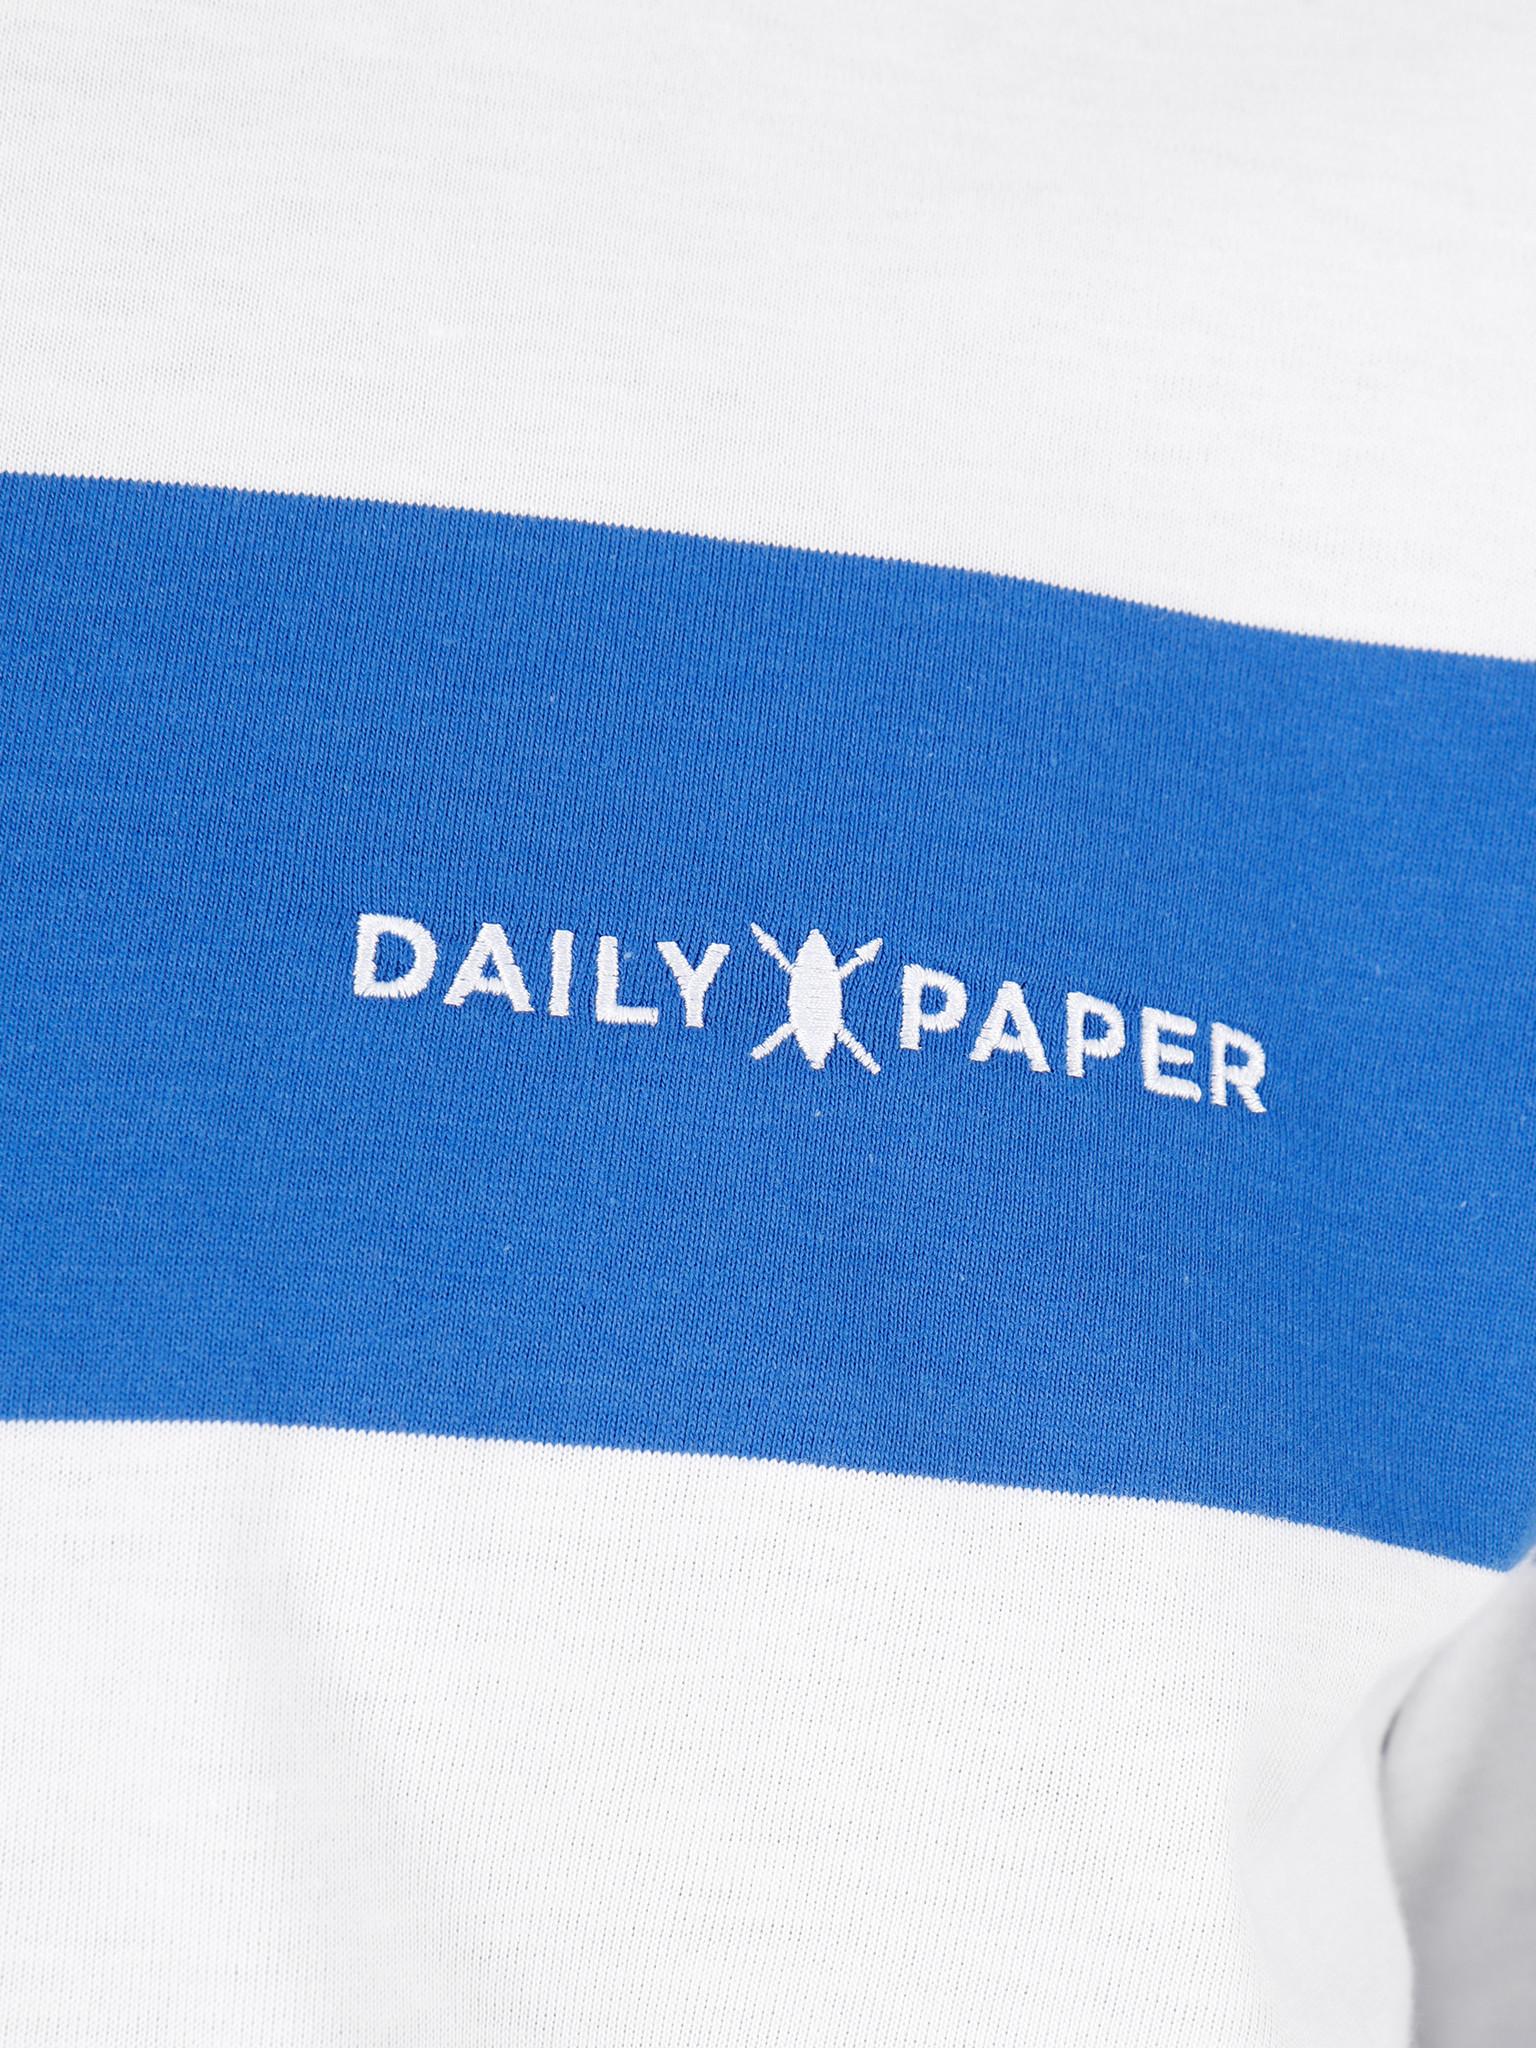 Daily Paper Daily Paper Striped T-Shirt Olympian Blue Stripe 20E1TS03-01